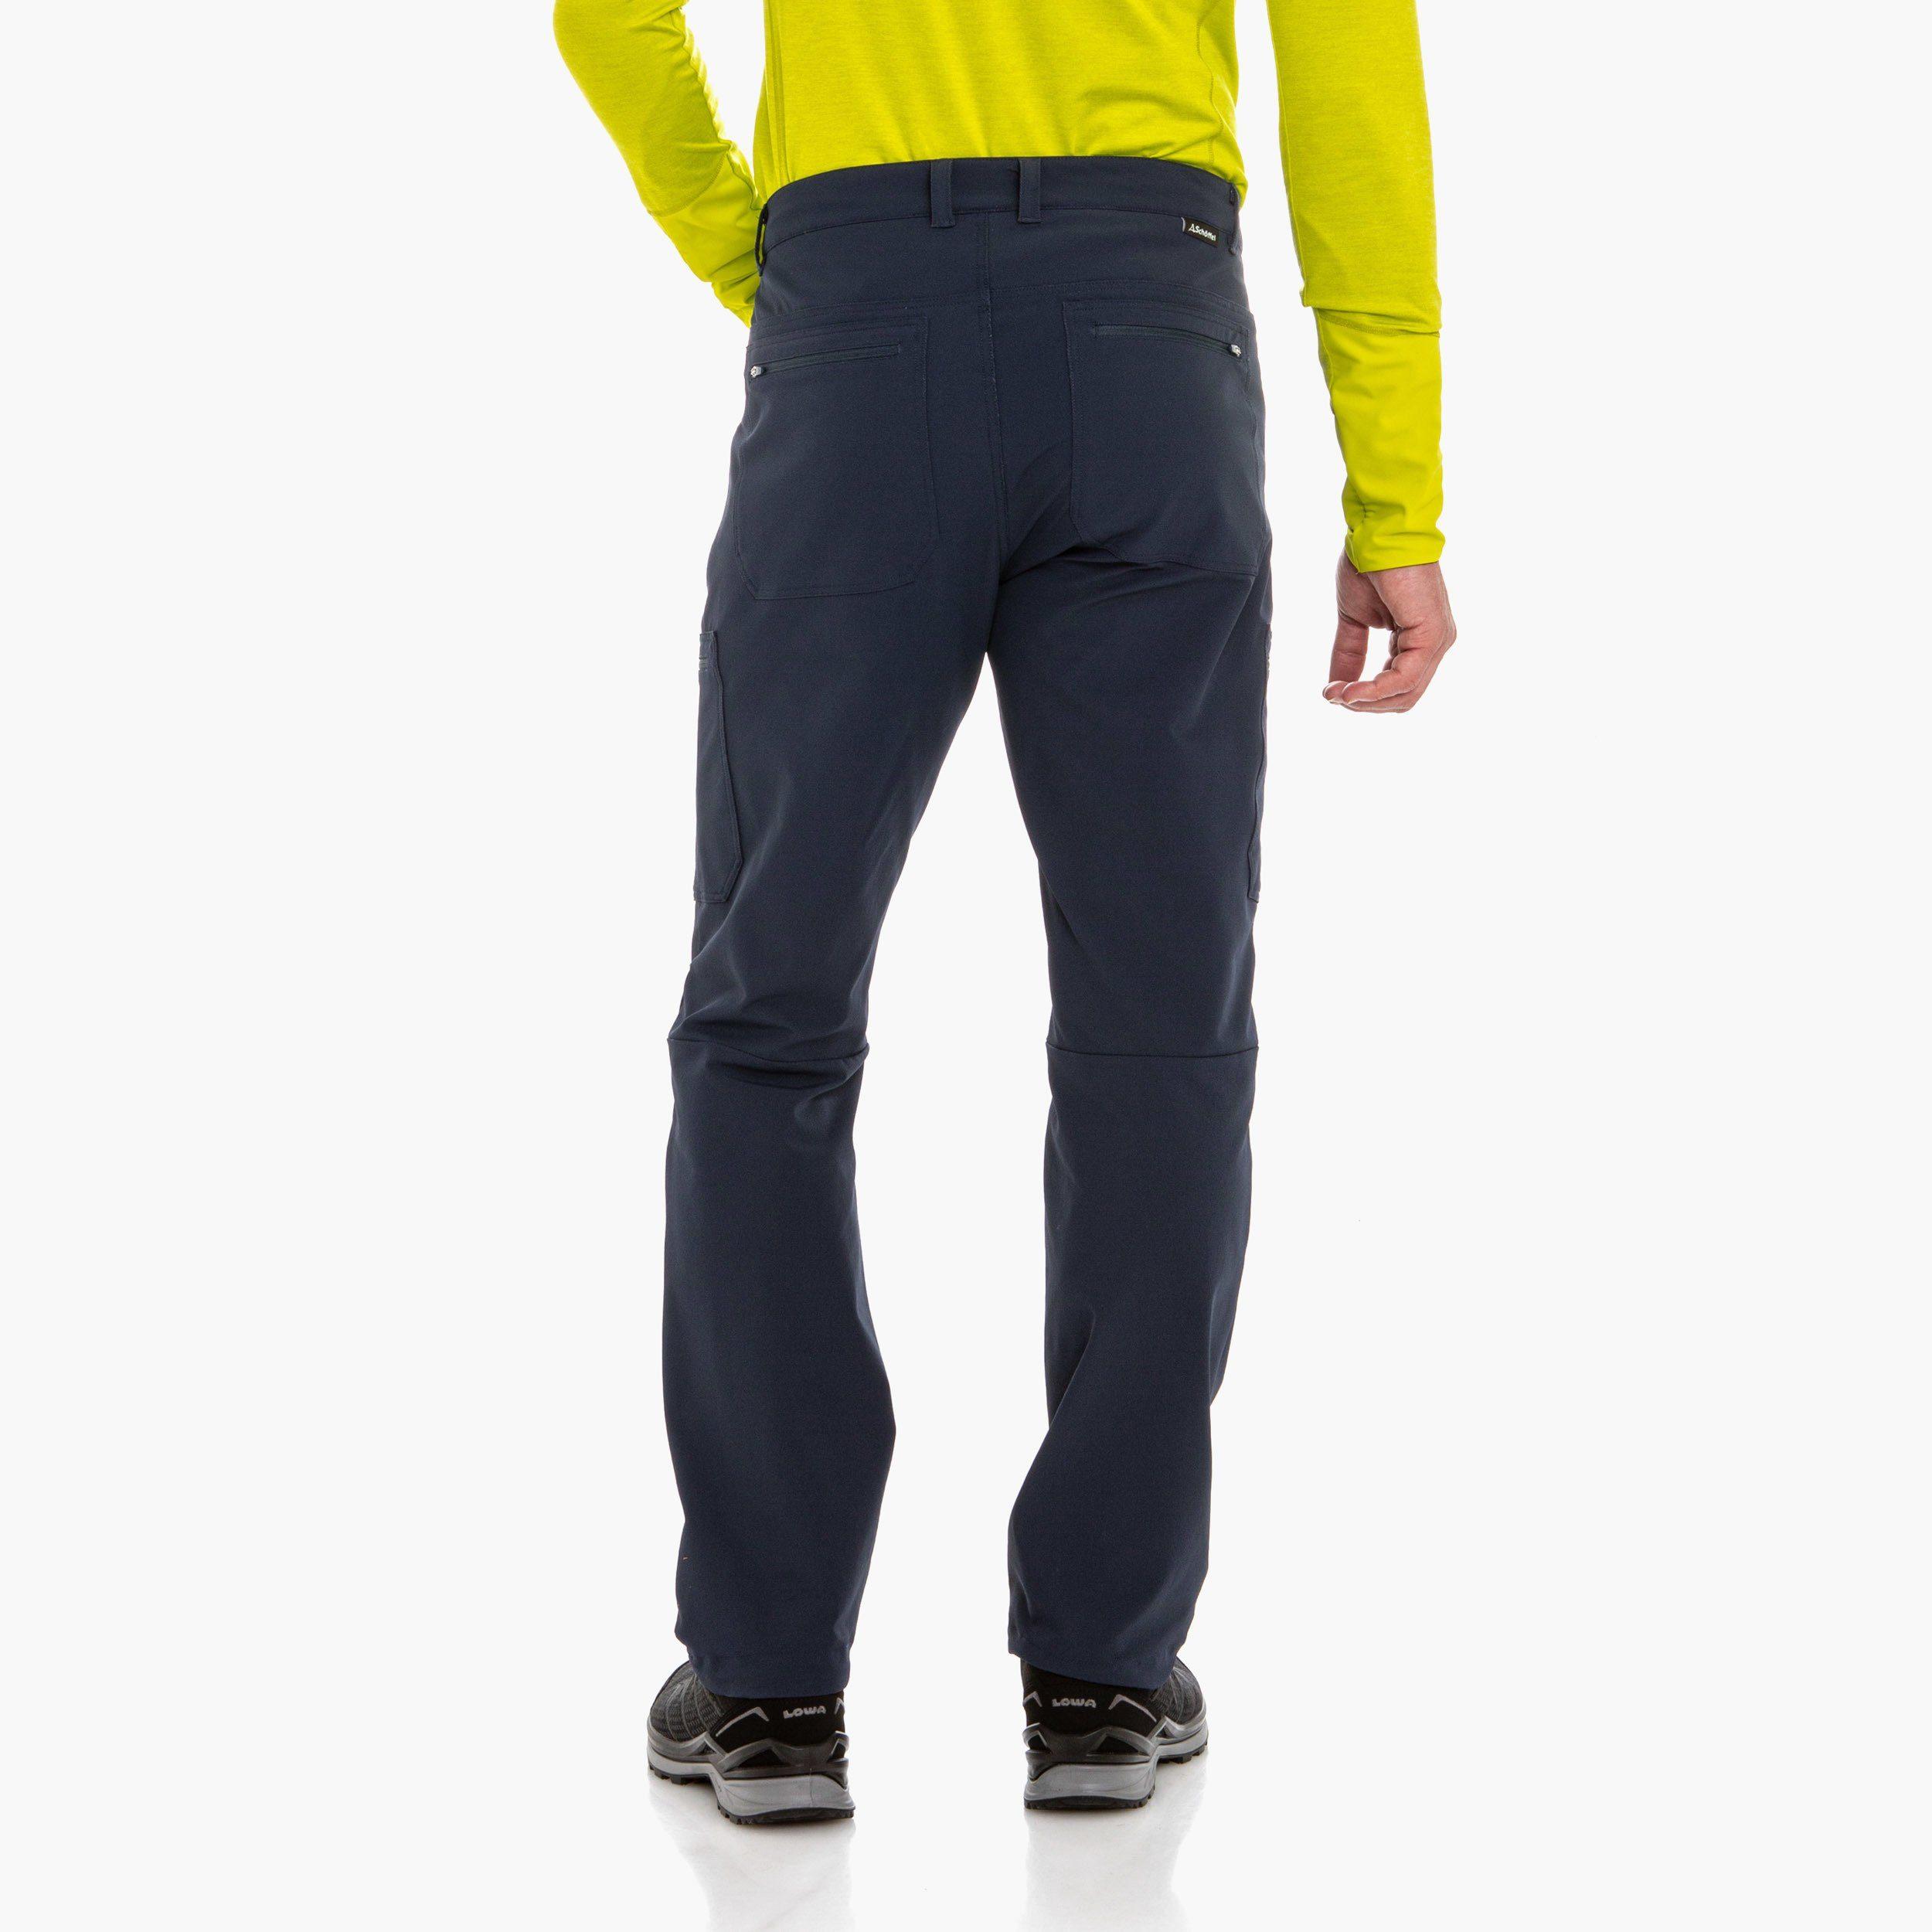 »pants Outdoorhose Outdoorhose Kaufen Schöffel Florenz2« Florenz2« Schöffel Kaufen »pants UzpLMGjqSV